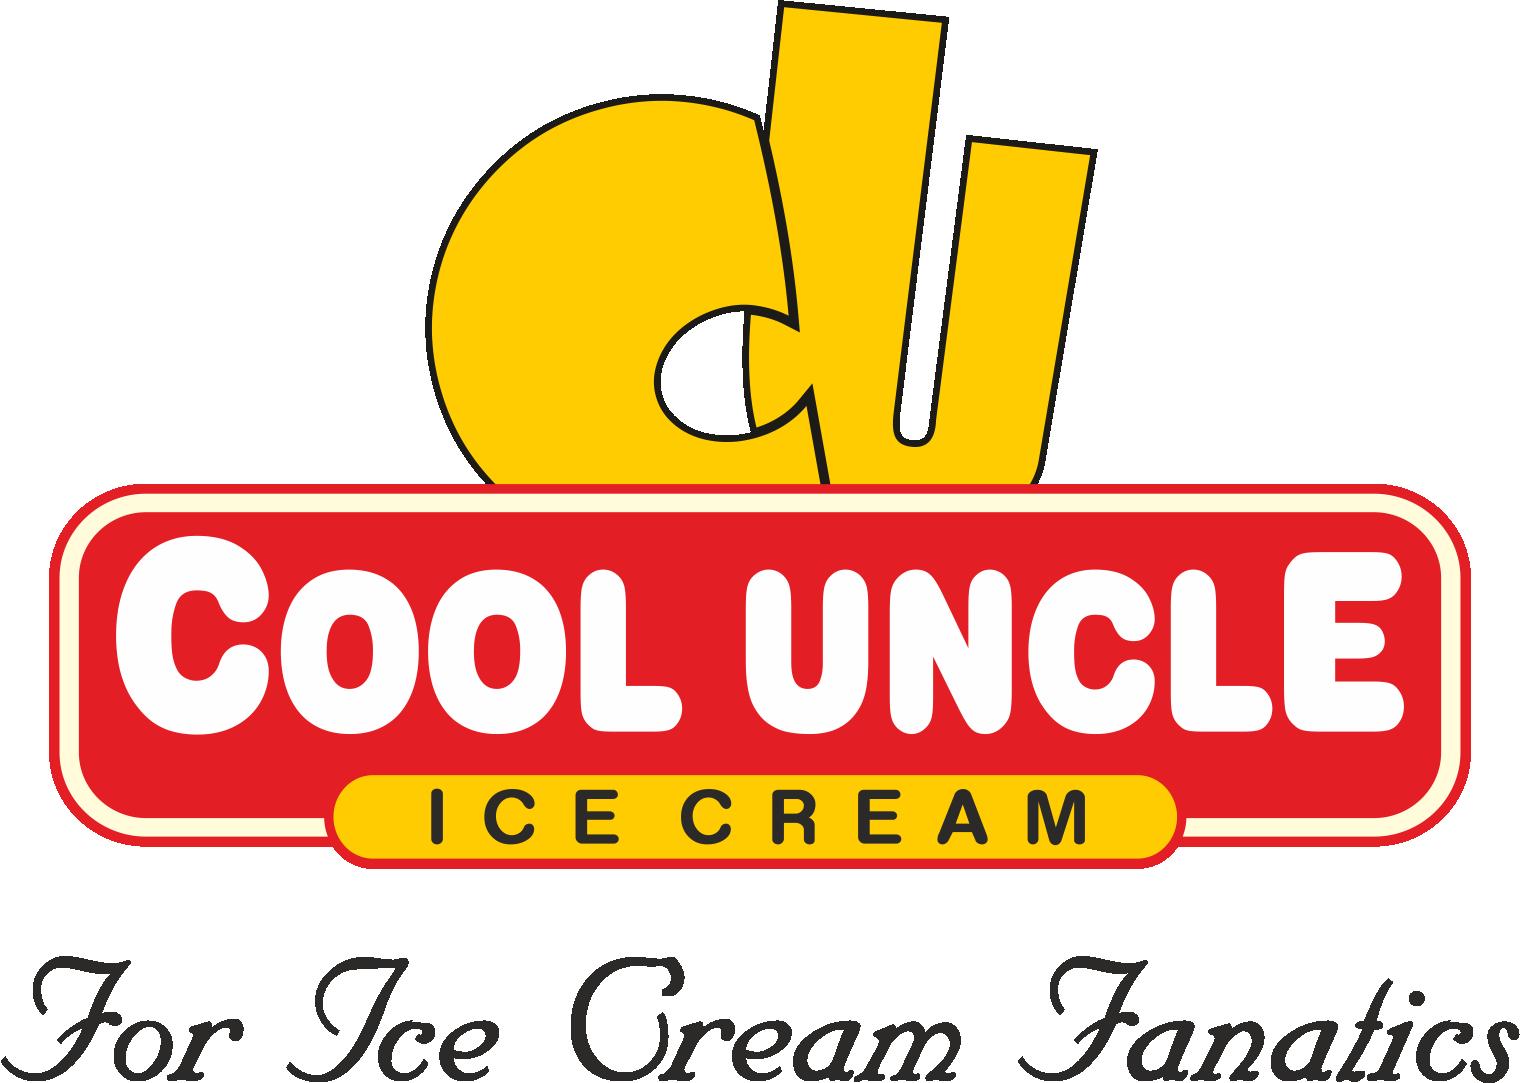 Rockwell_Freezer_Testimonial_cool-uncle